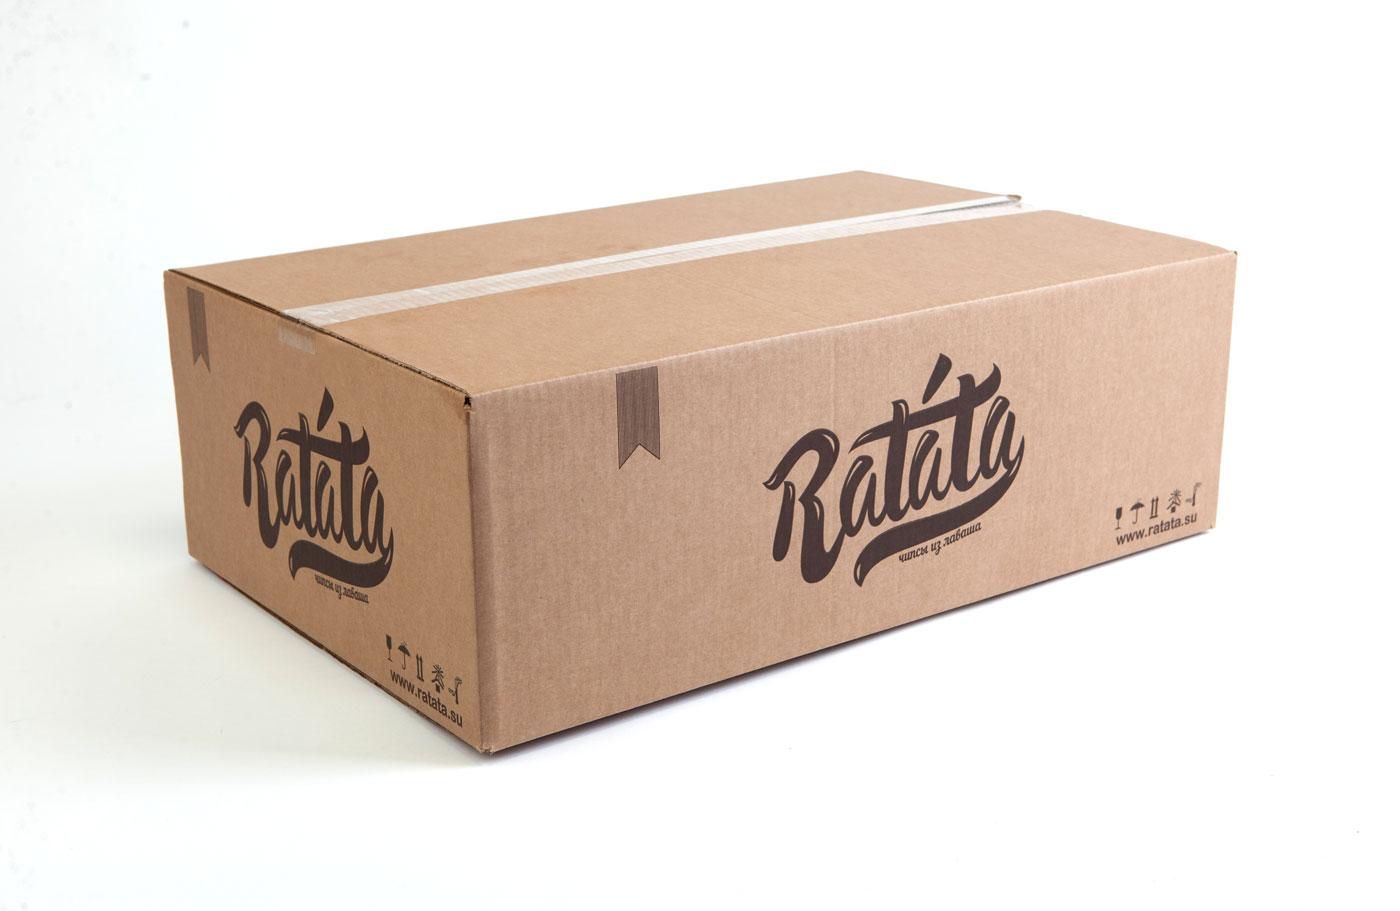 фото коробки чипсов ratata